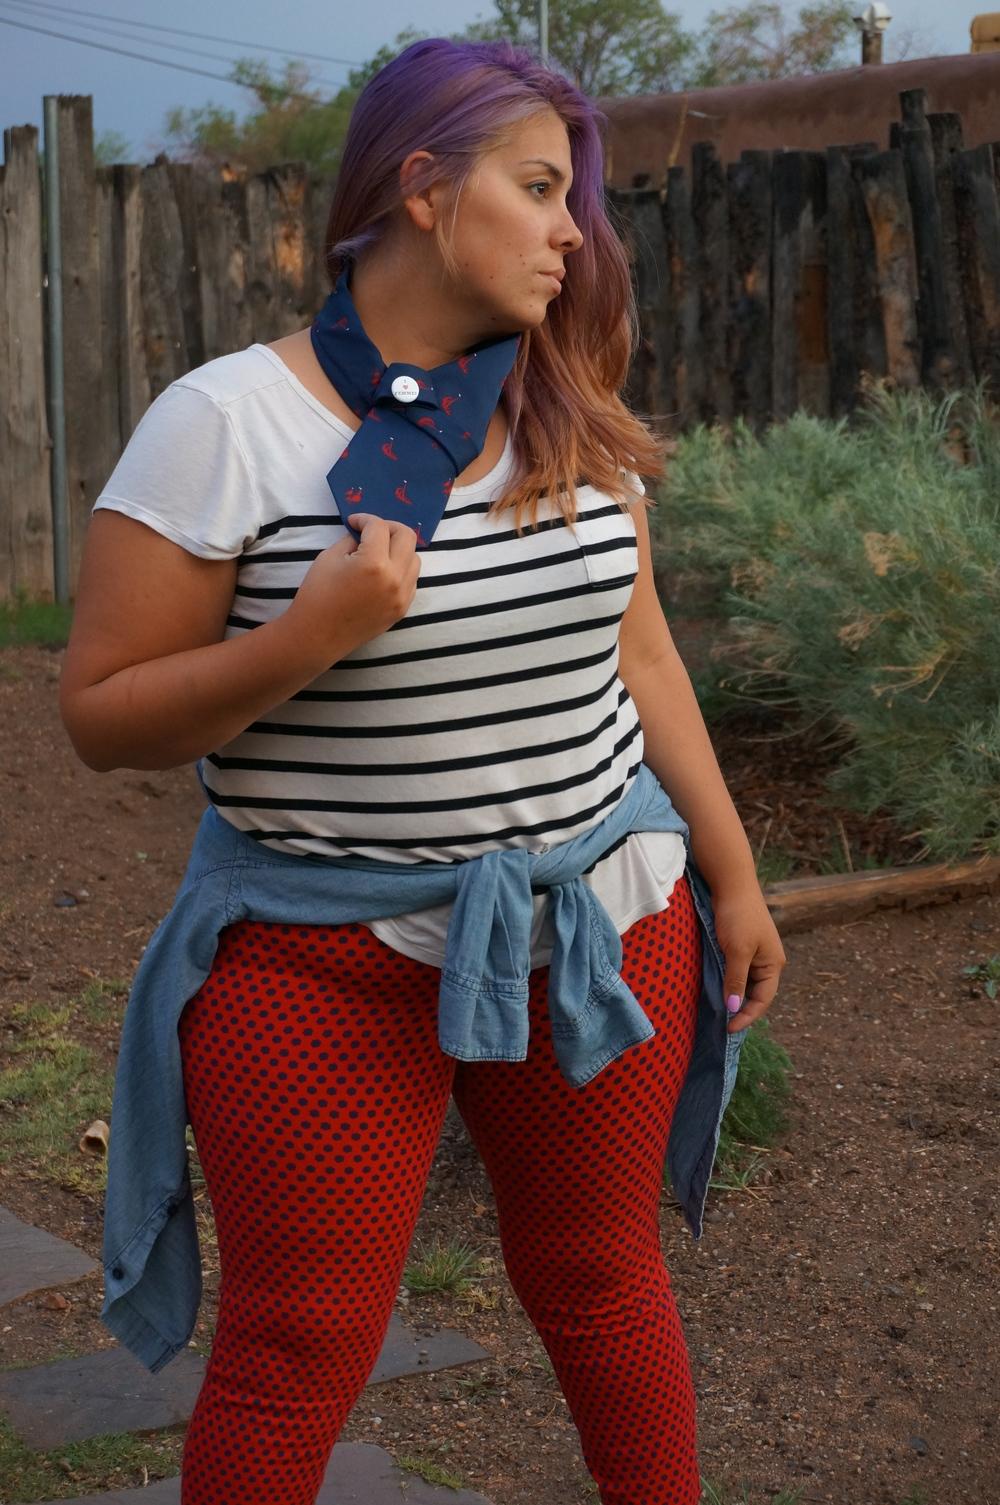 Baroness Sophia Designs Art Tie Qwear